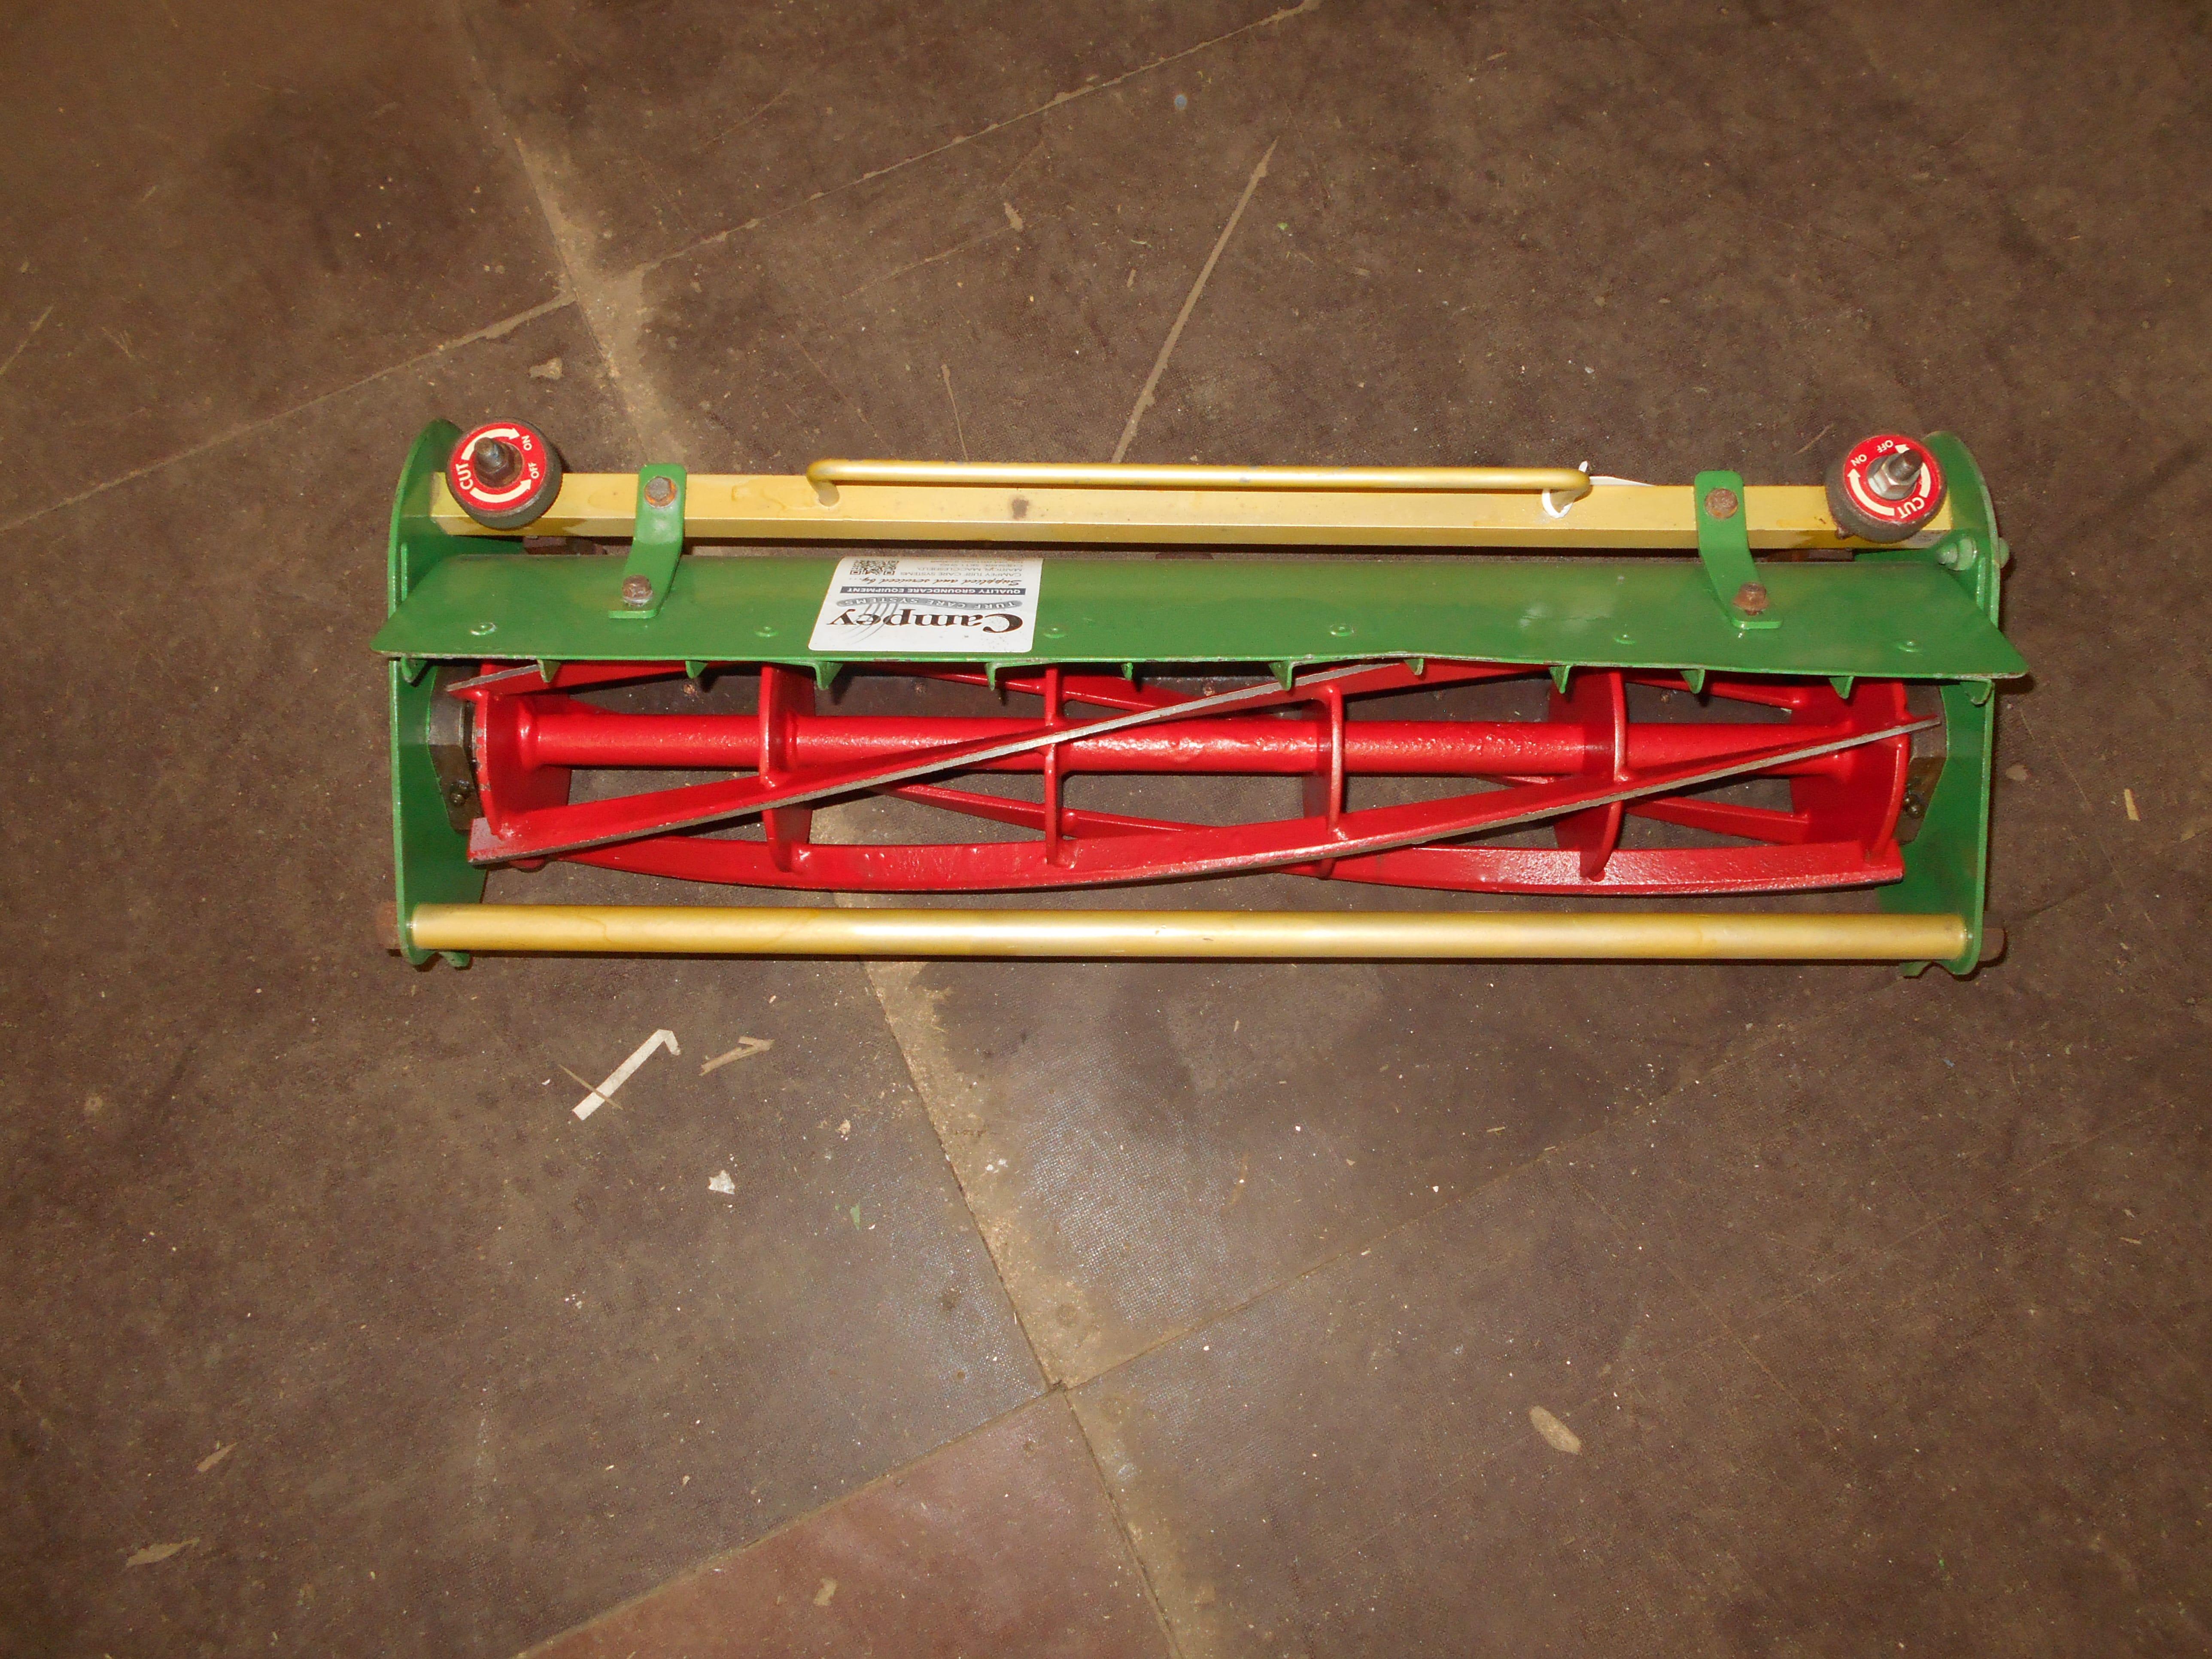 Dennis FT610 5-blade cylinder cassette - Uxxx